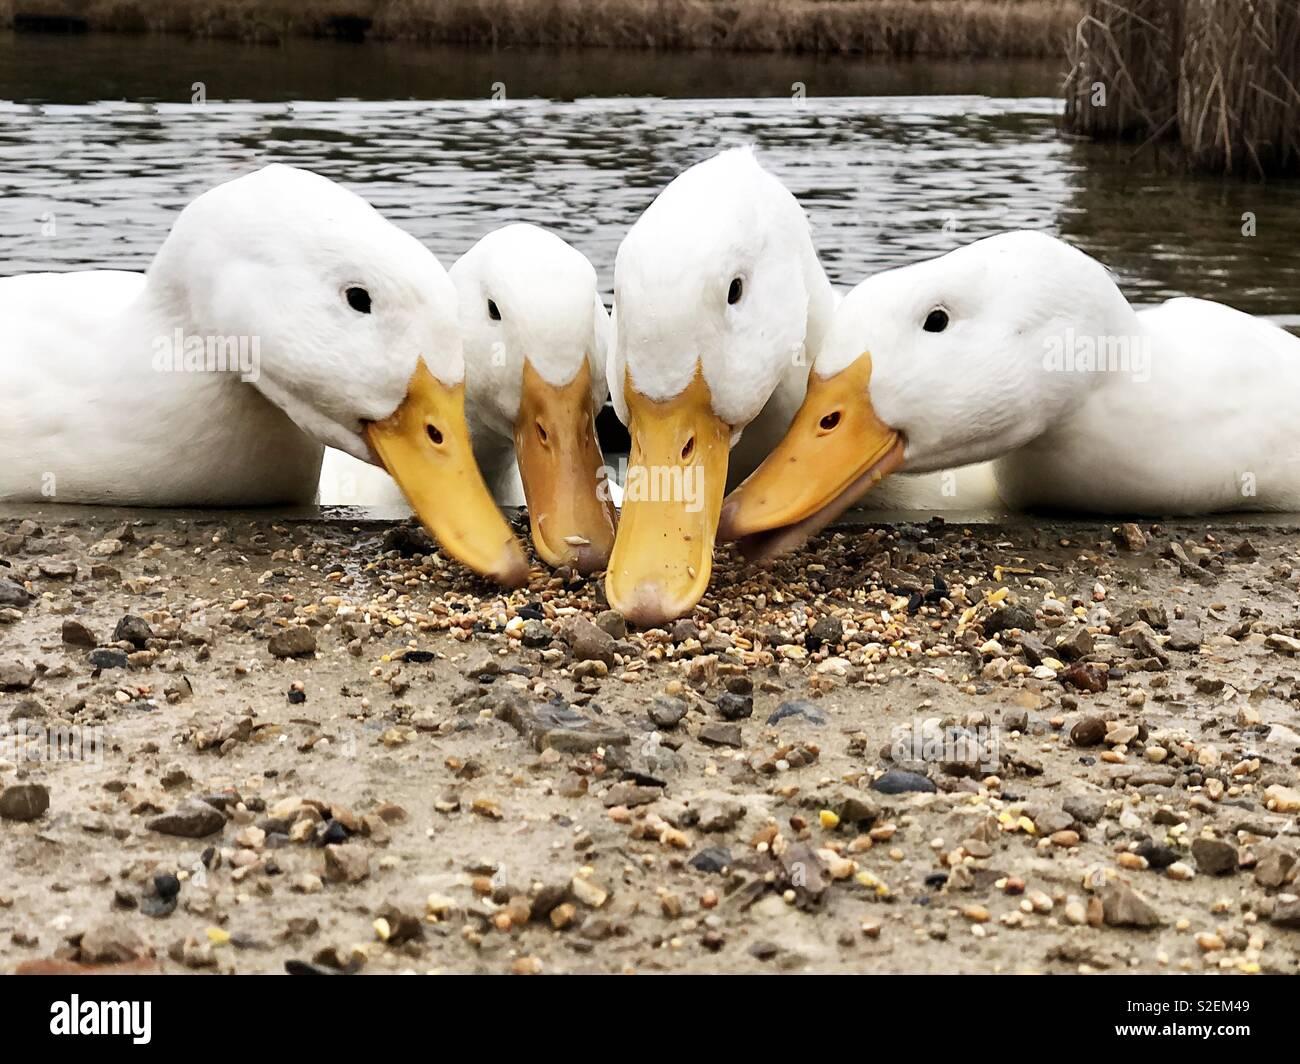 Four heavy white AmericanPekin ducks with orange beaks together - Stock Image